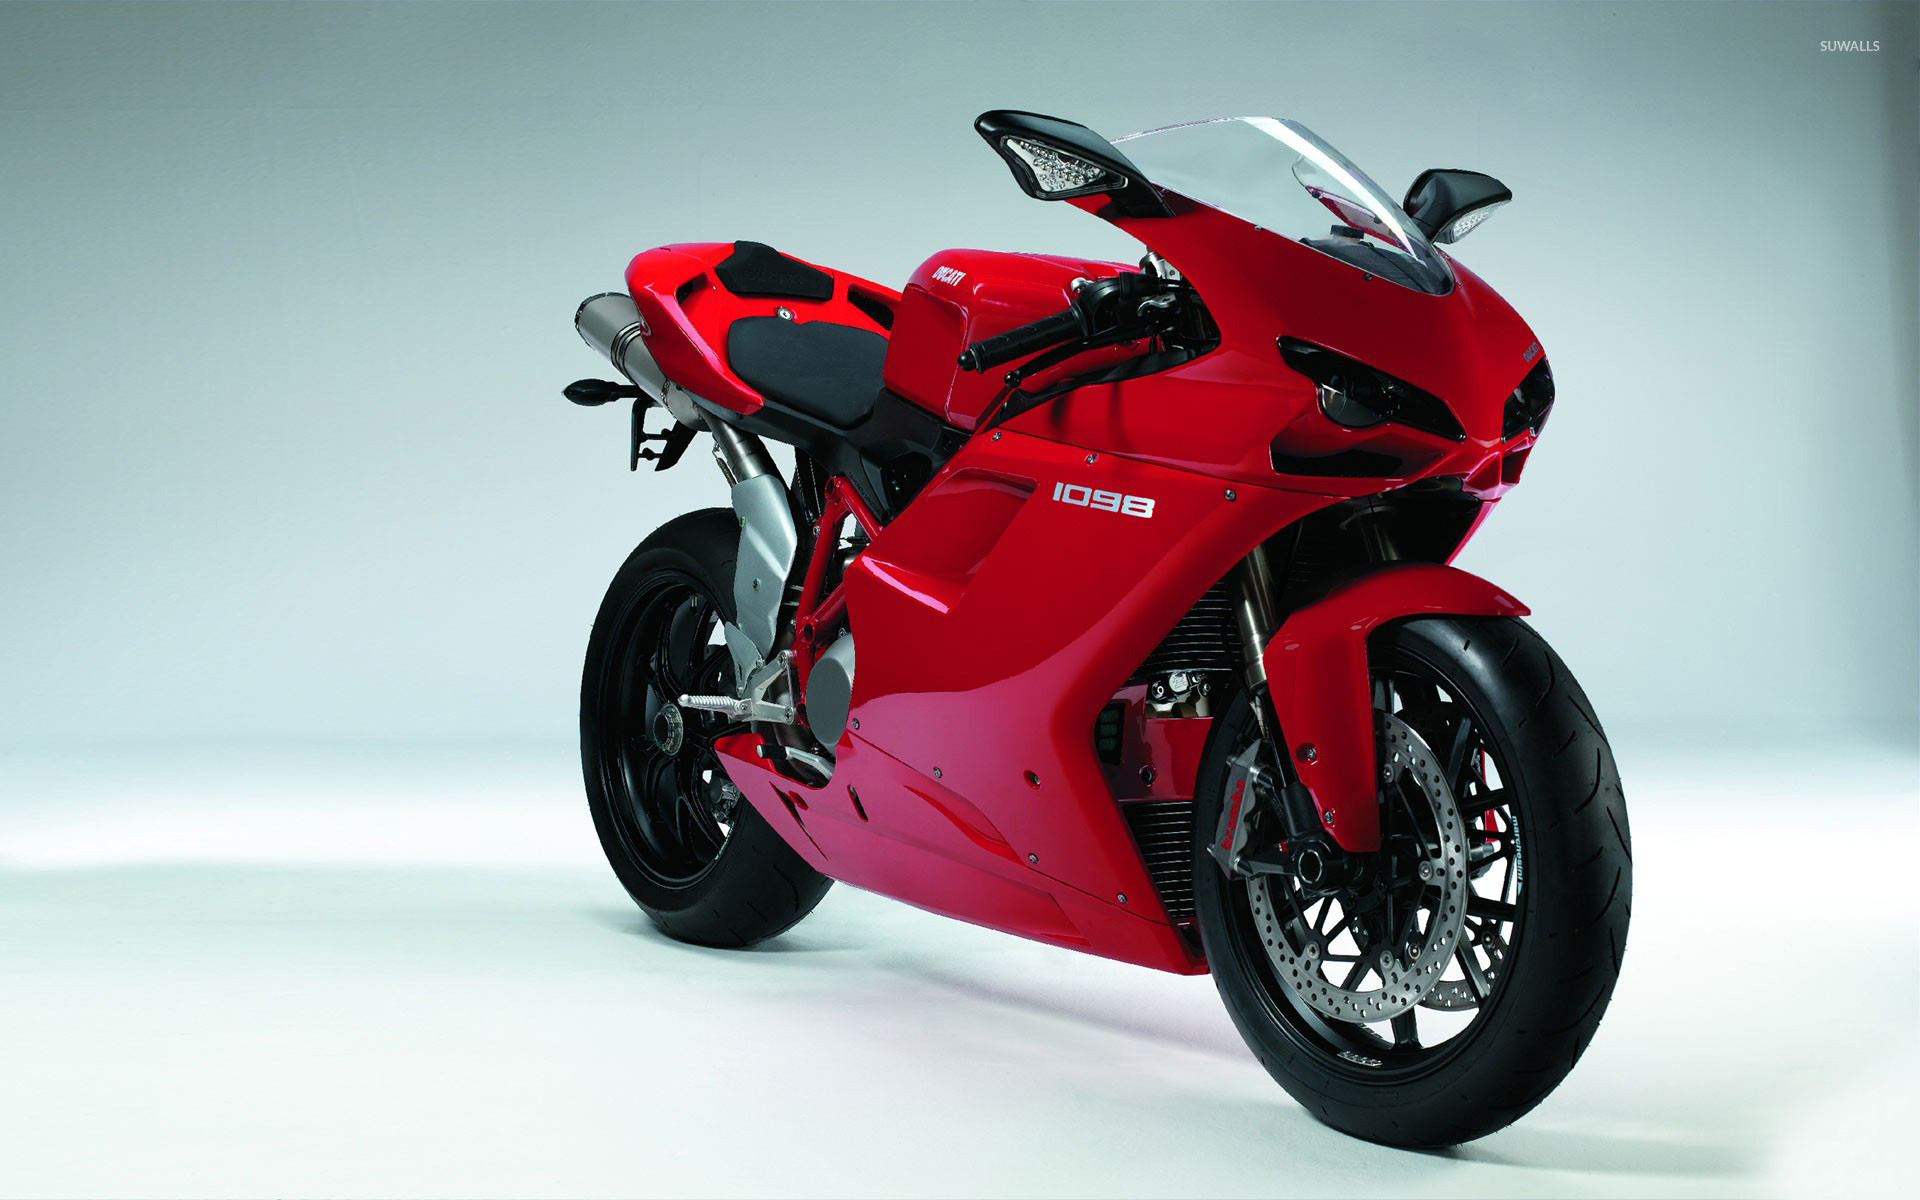 Ducati 1098 Wallpaper Motorcycle Wallpapers 10040